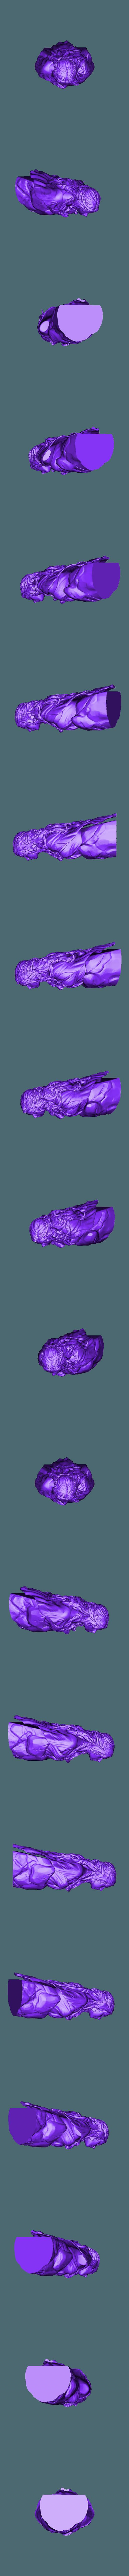 Targaryen_Cut.stl Download free STL file Daenerys Bust • 3D printable template, MundoFriki3D